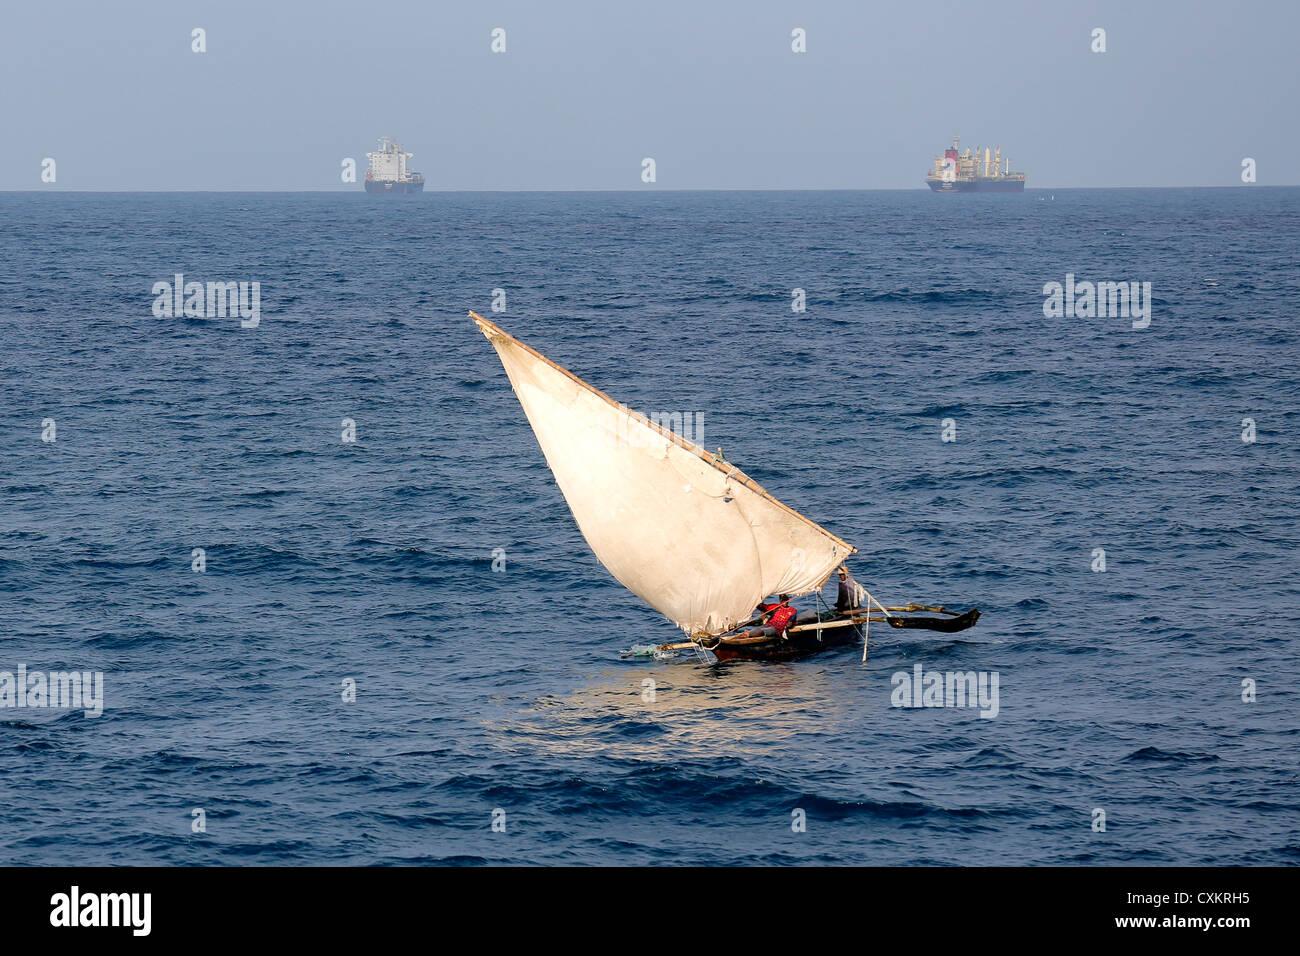 Arab sailing boat (dhow) off the Tanzanian coast - Stock Image